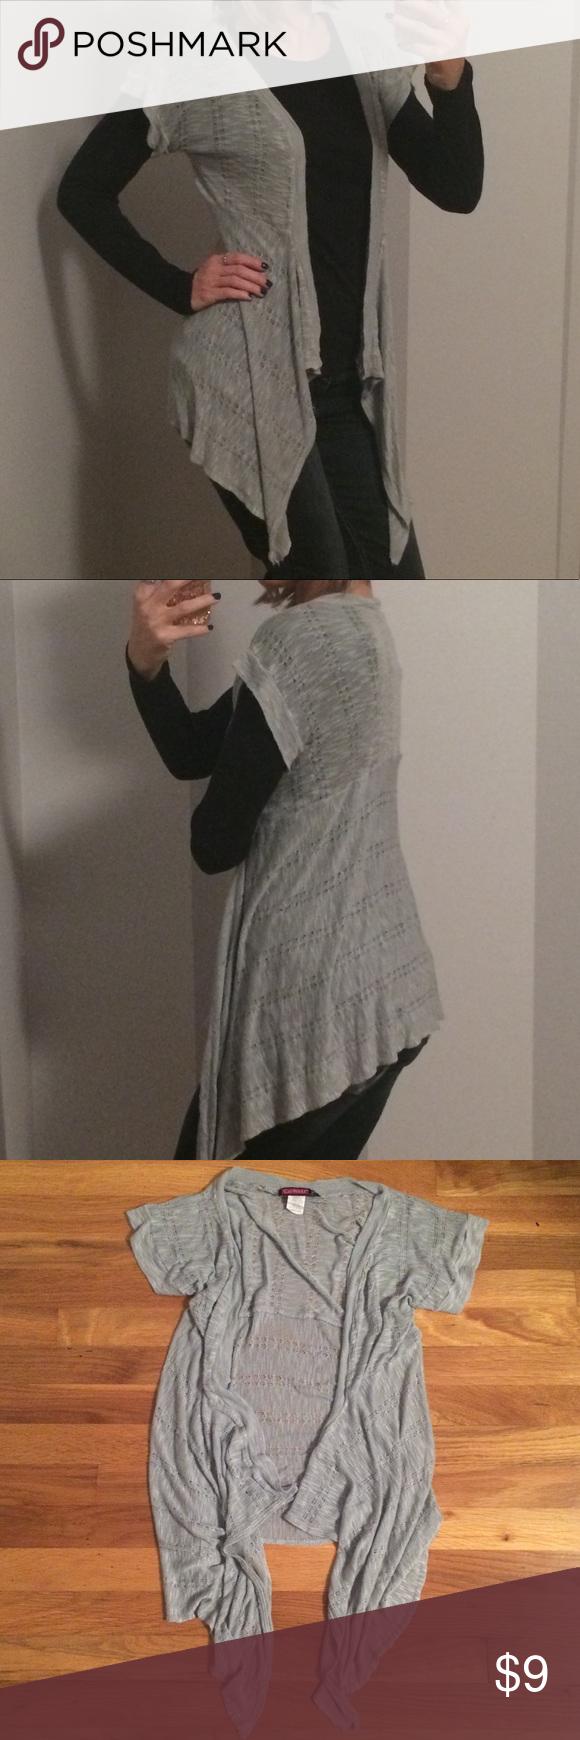 Short Sleeve Cardigan Wrap Sweater | Short sleeves, Wraps and ...